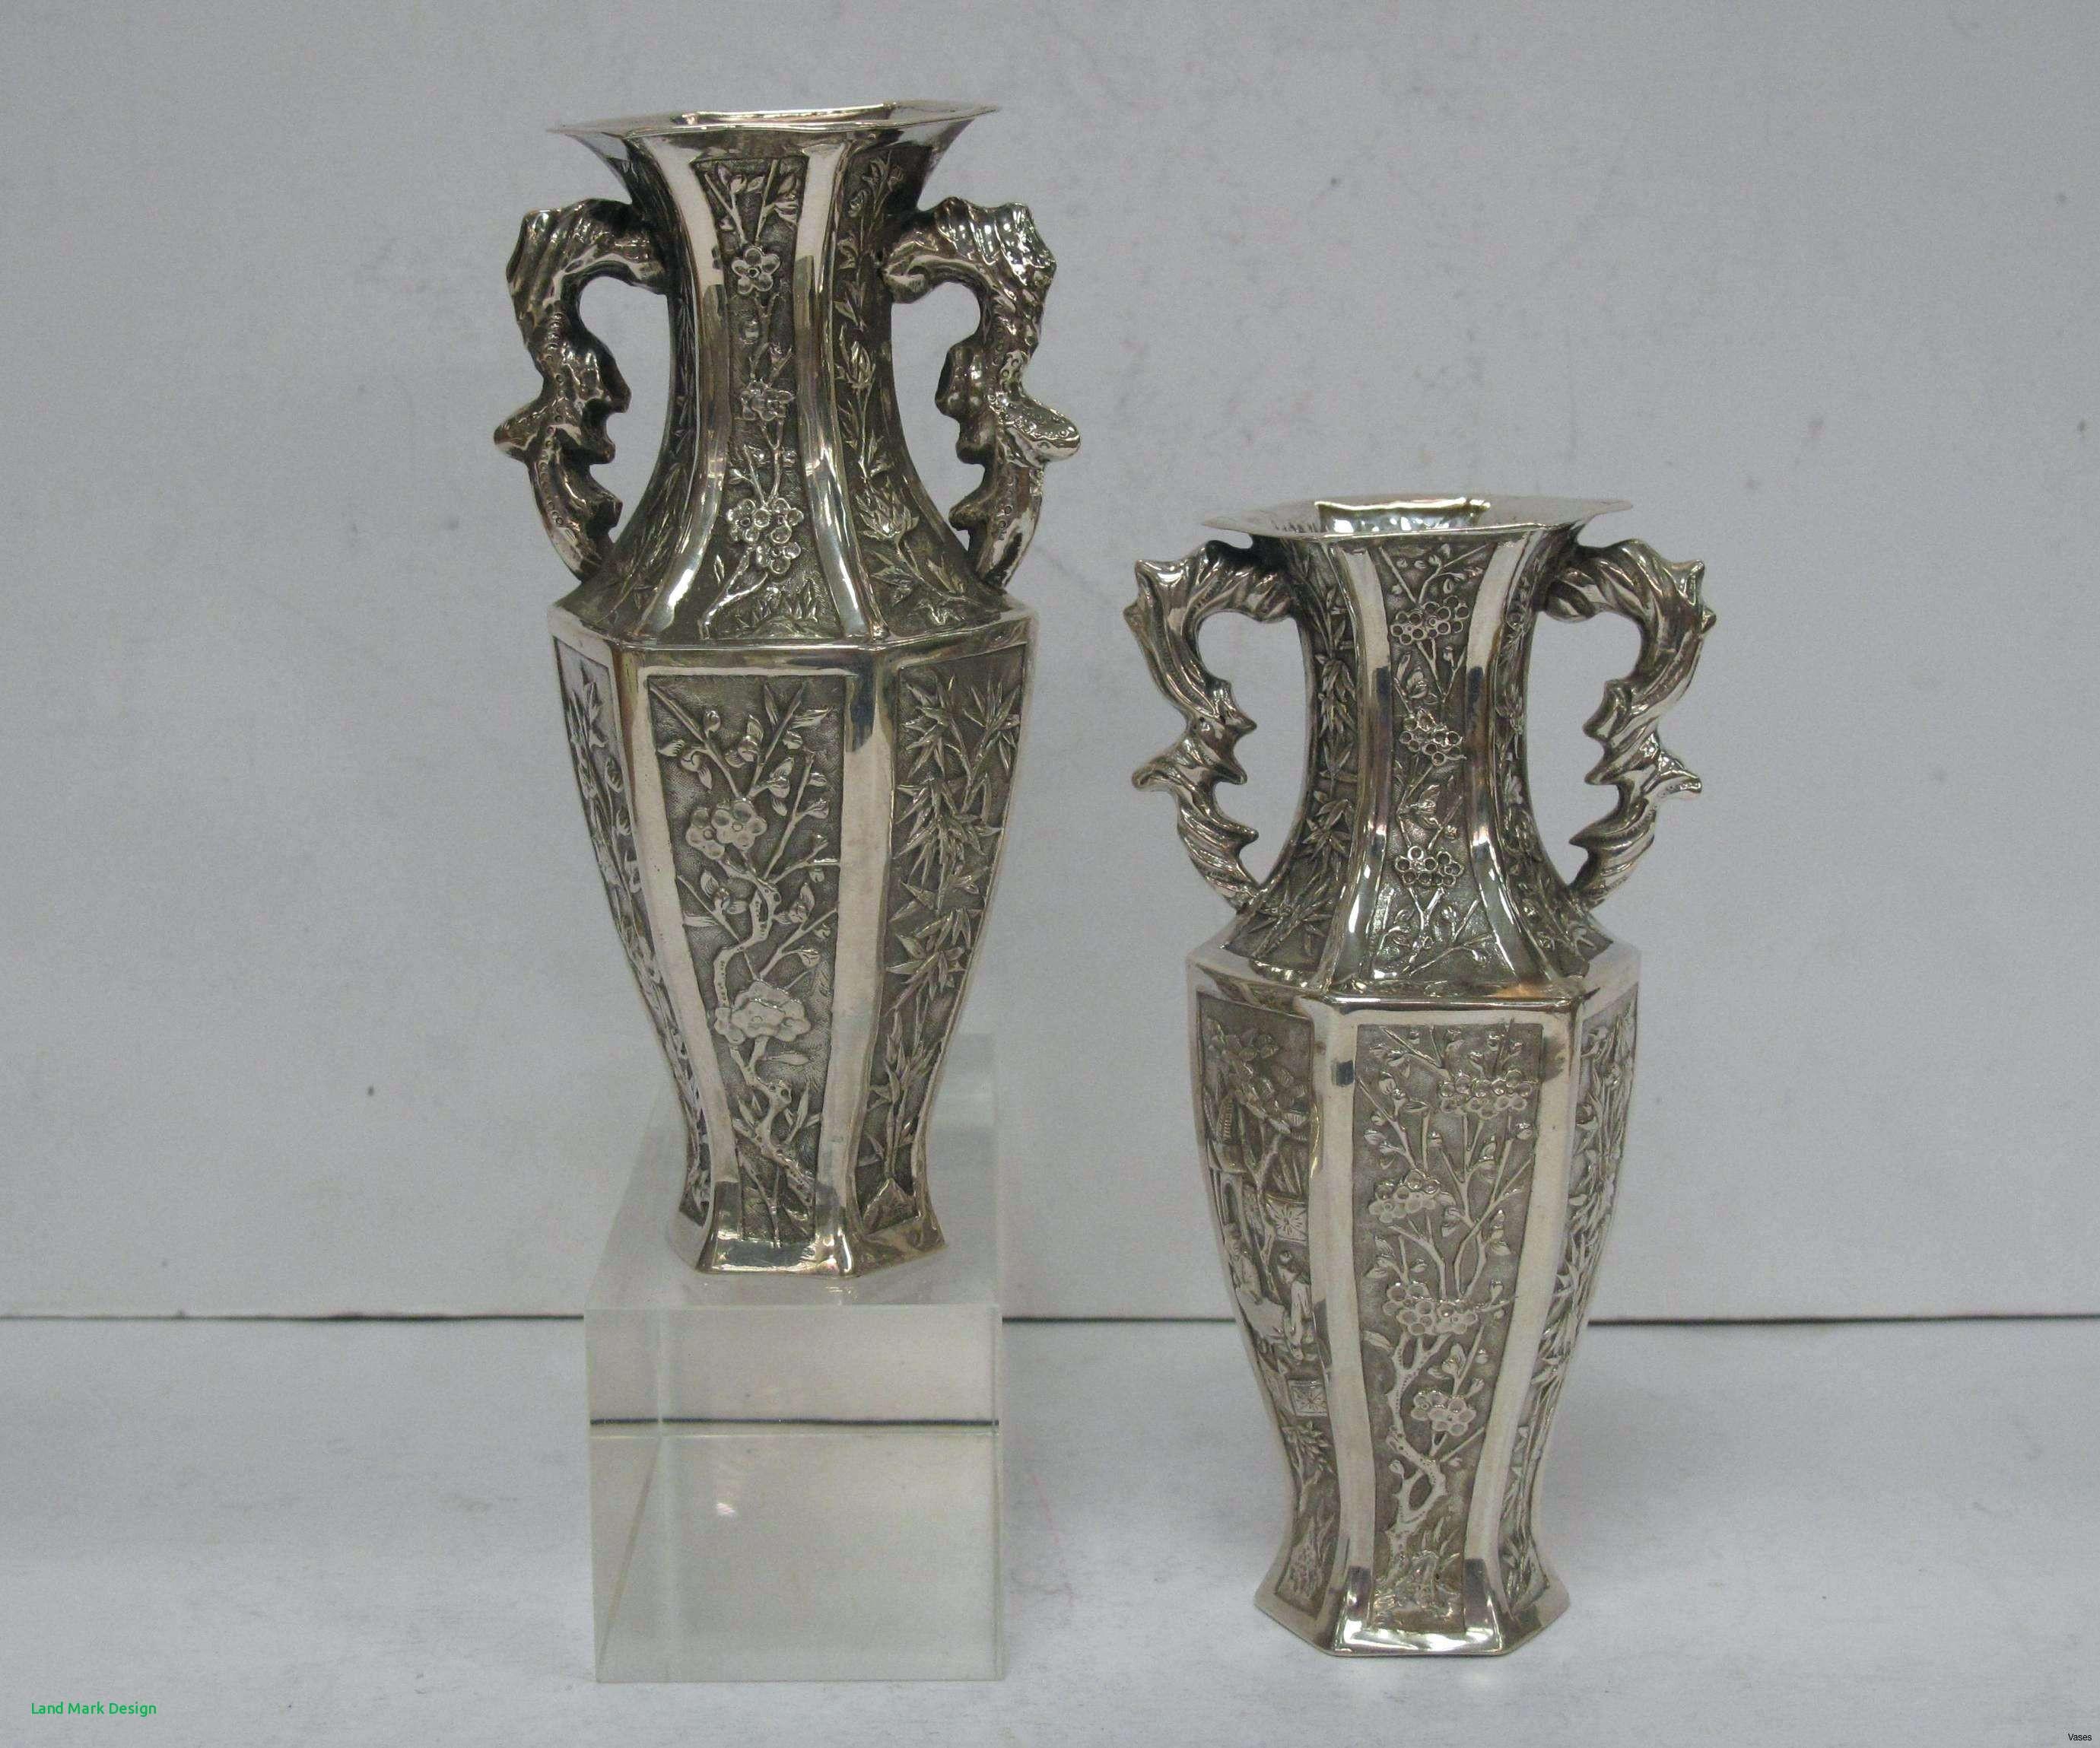 clear cube vase of 15 best of square vases in bulk bogekompresorturkiye com throughout 8253h vases bulk silver square glass cube vase with metallic band 6x6i 0d vases bulk silver